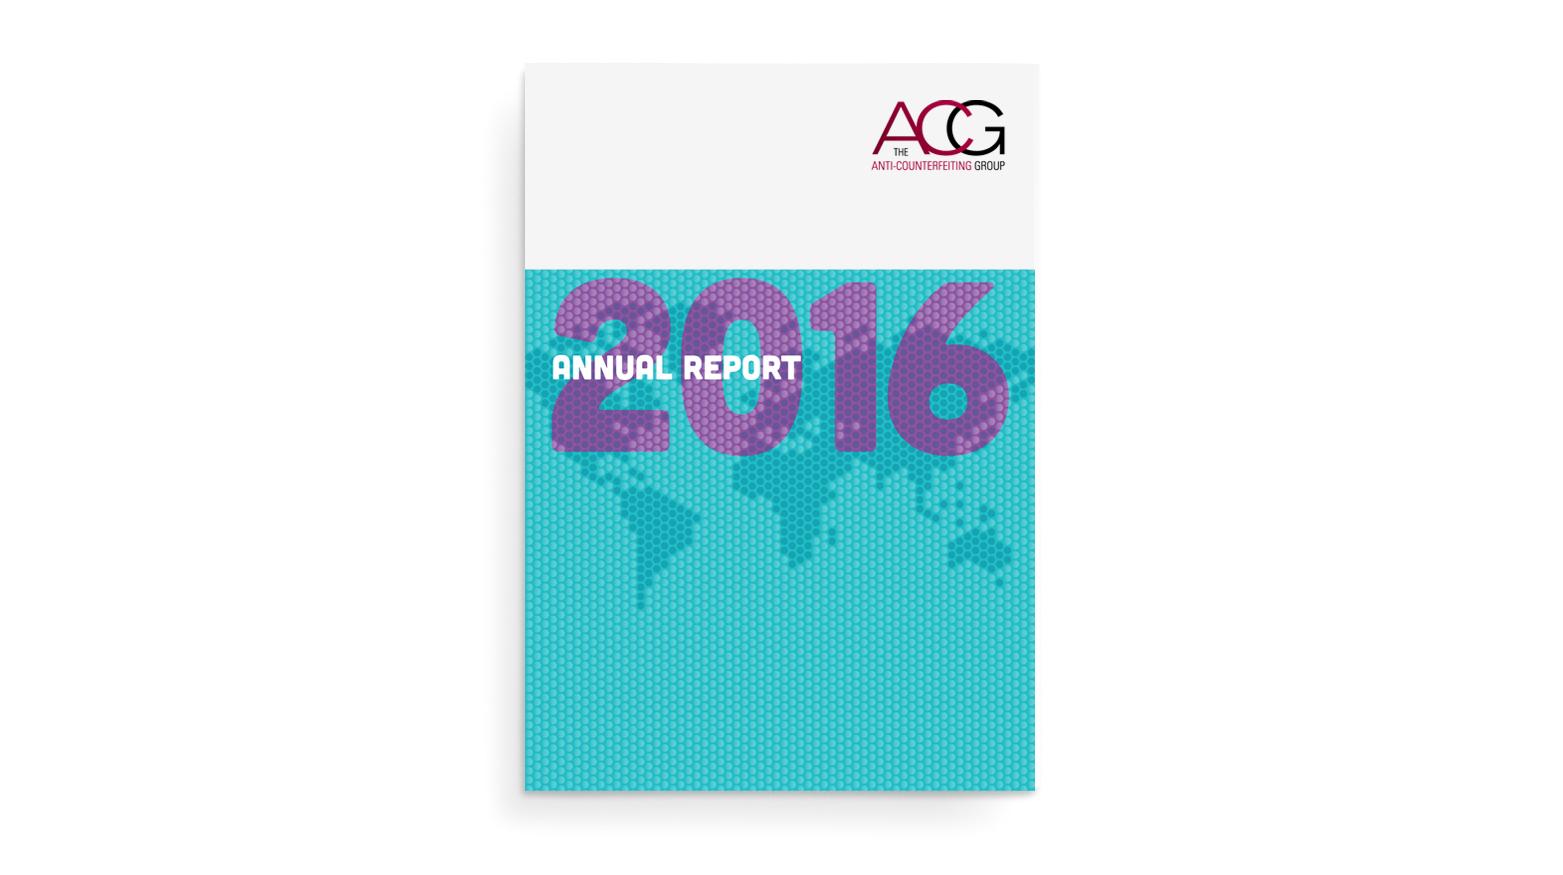 ACG annual report 2016 - cover design